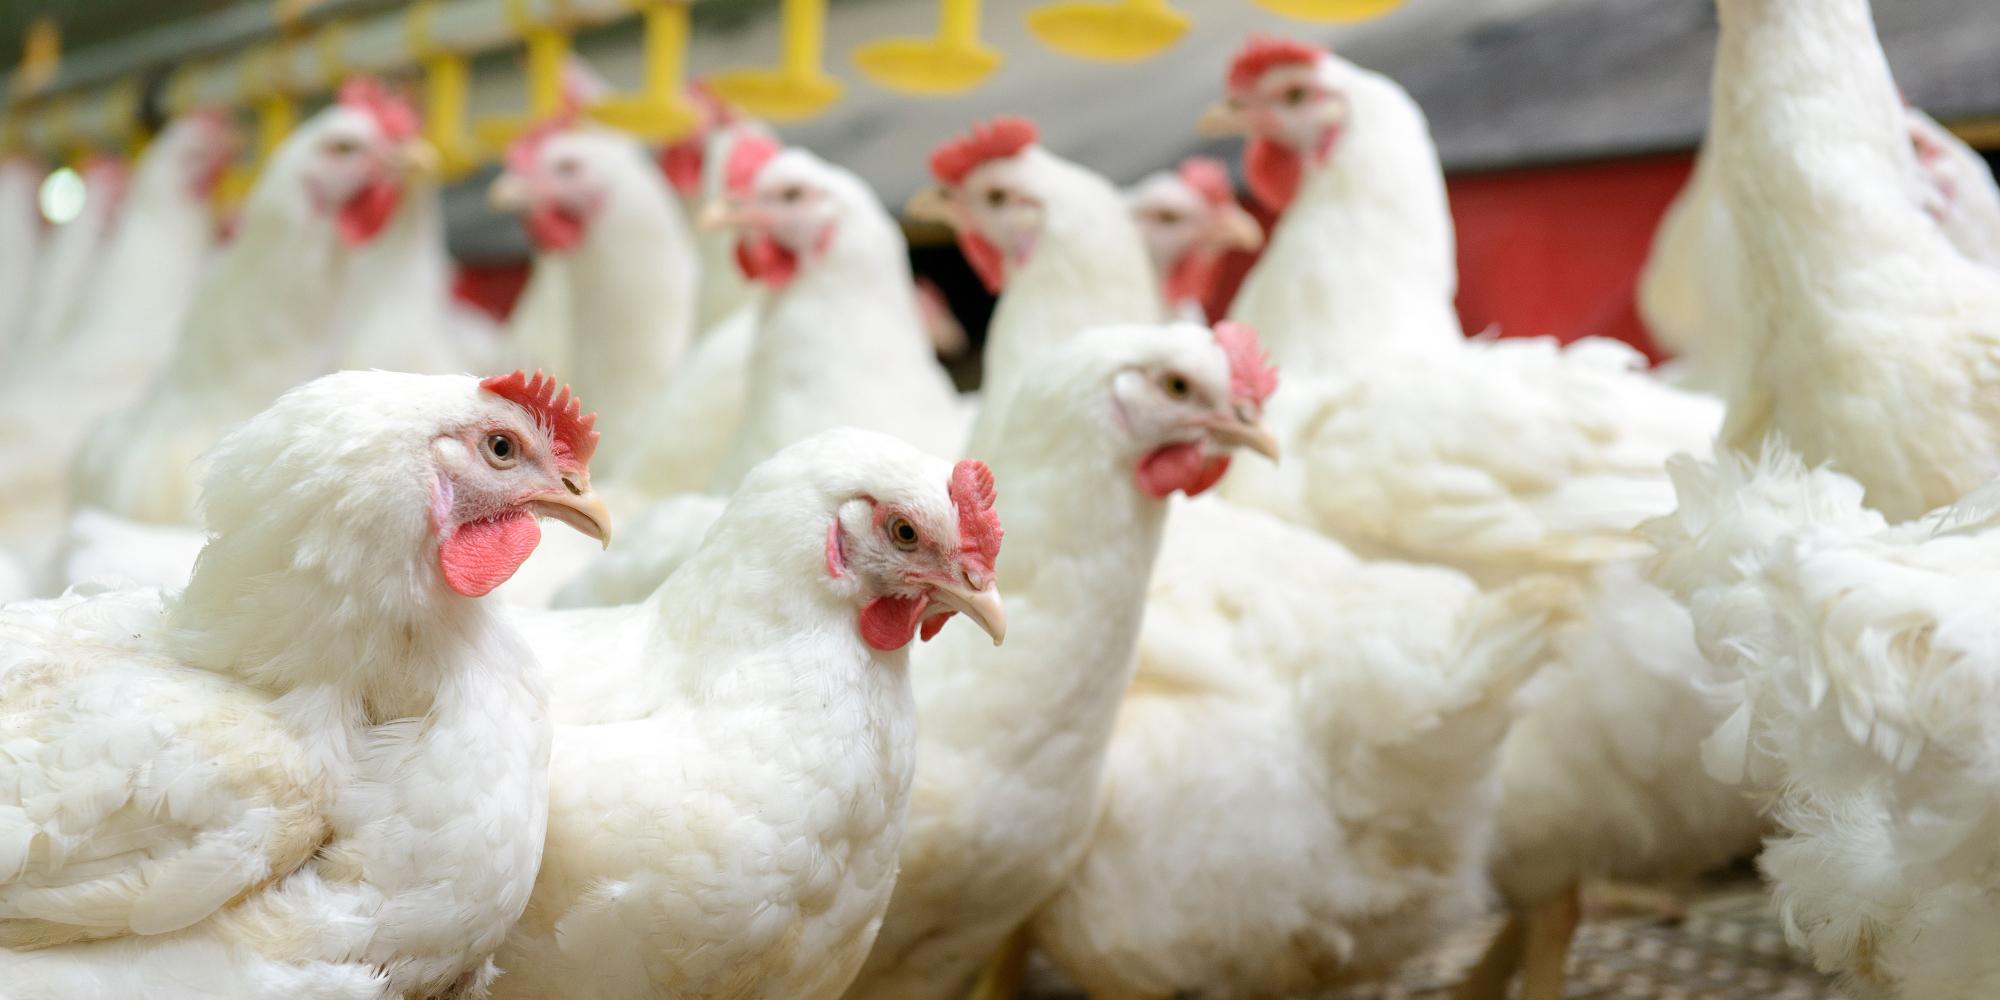 chlorinated chicken - photo #9